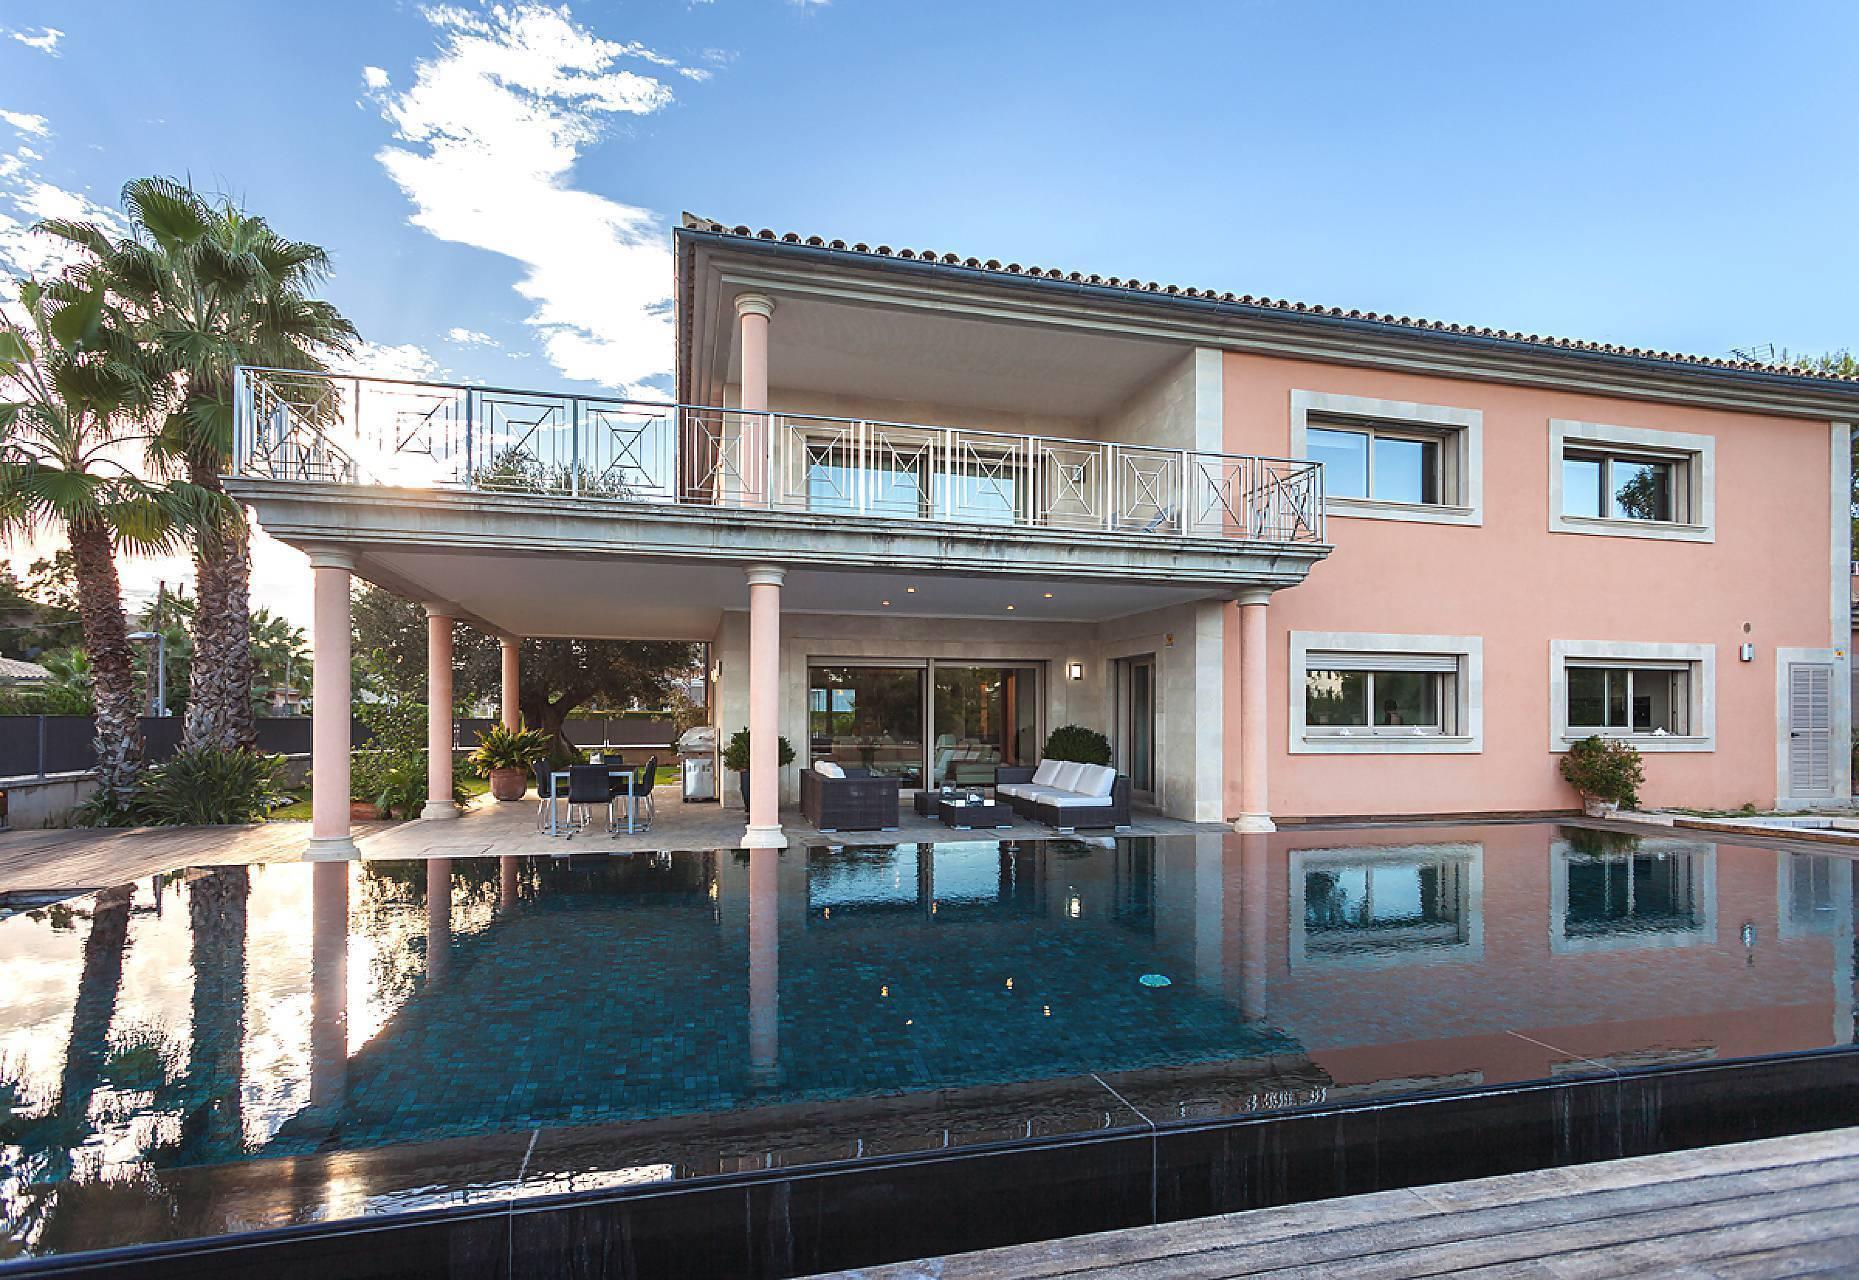 01-112 Modern villa Mallorca north Bild 4